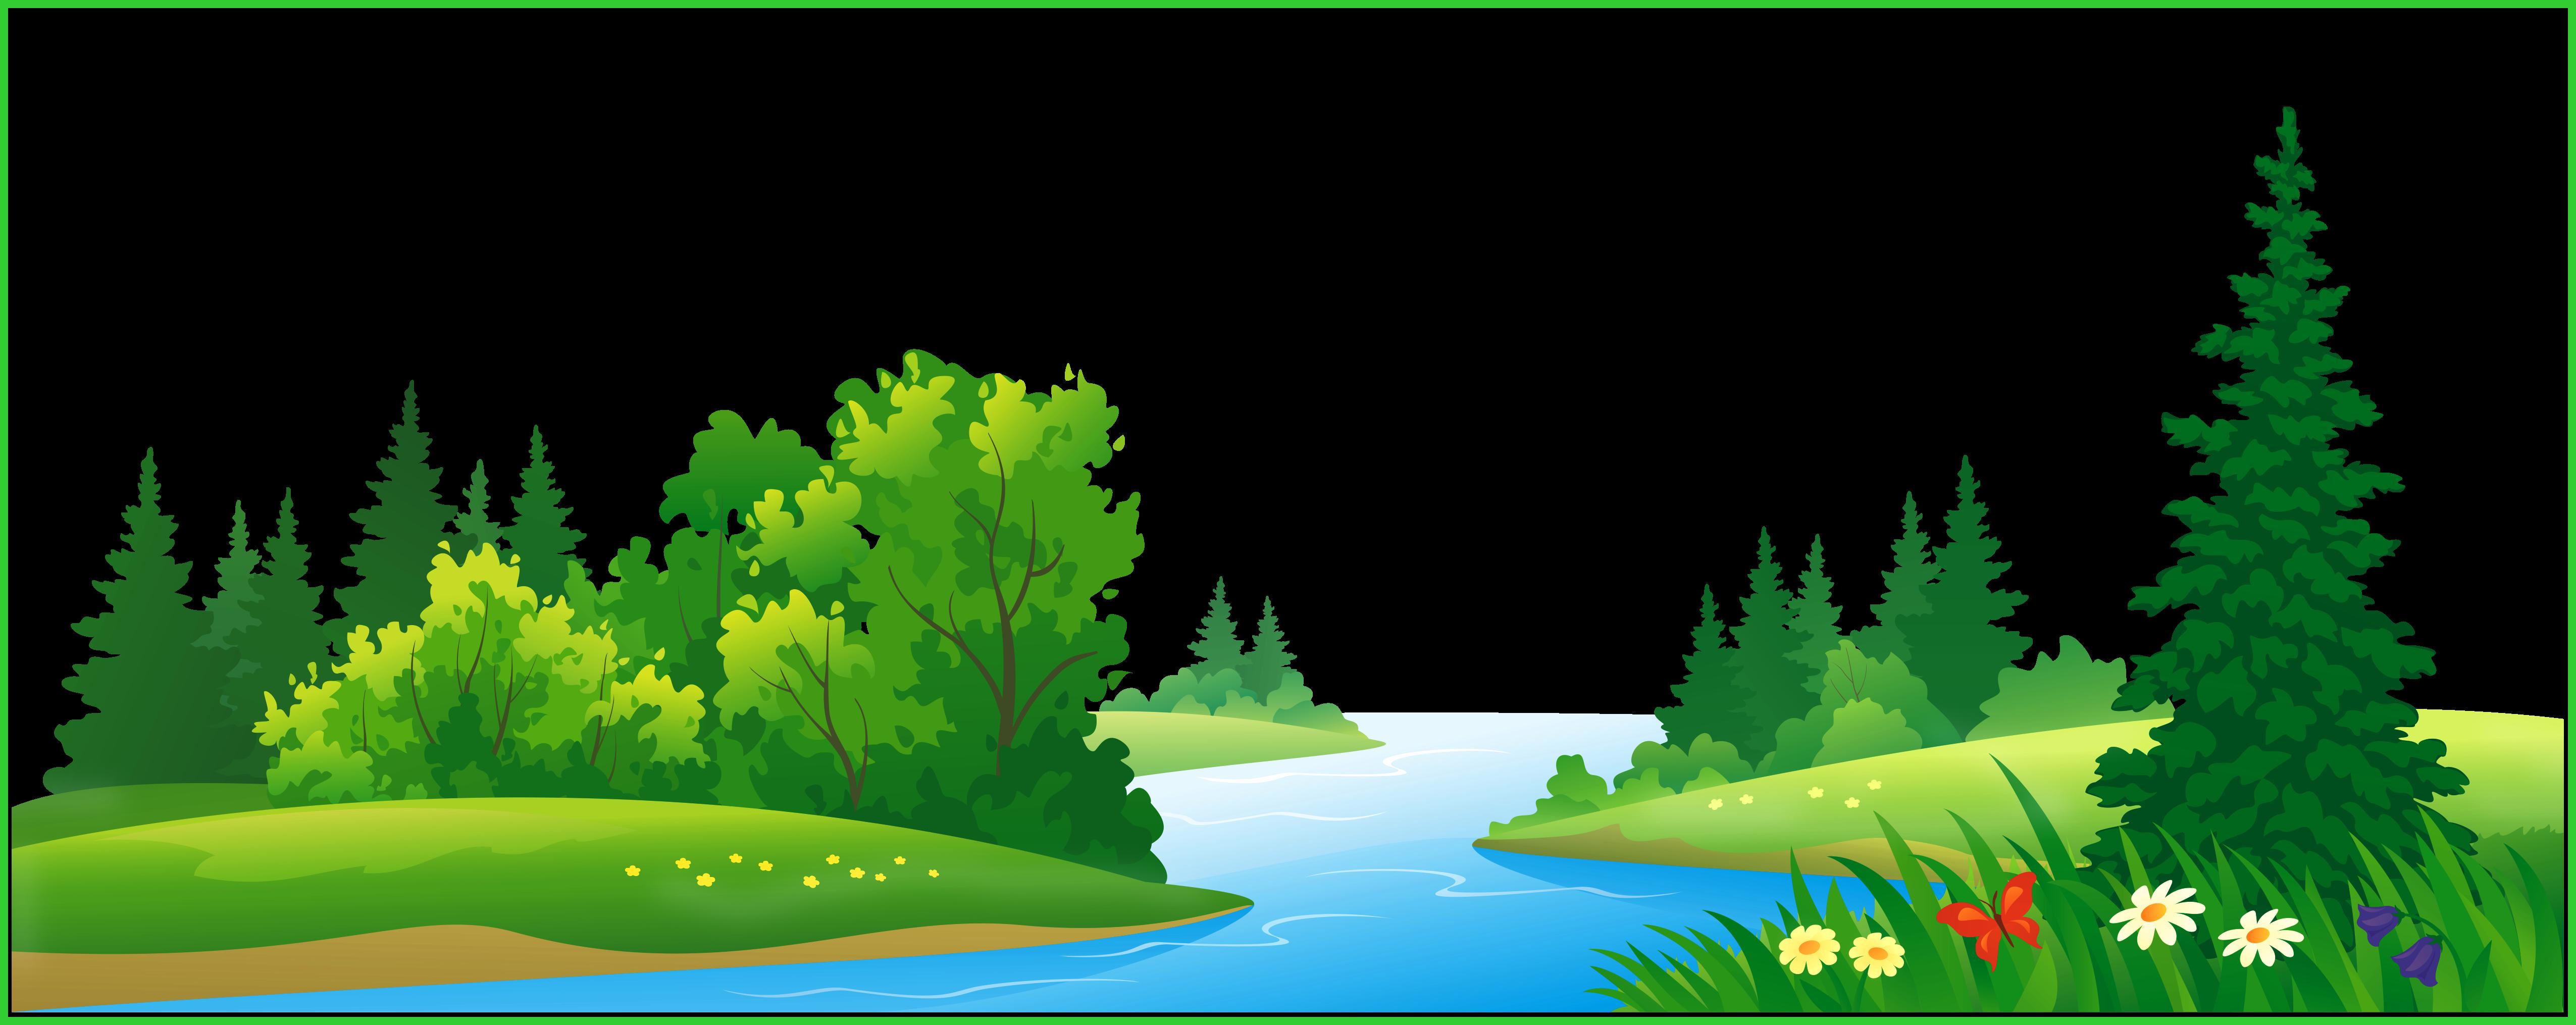 ideas of backdrop. Design clipart nature